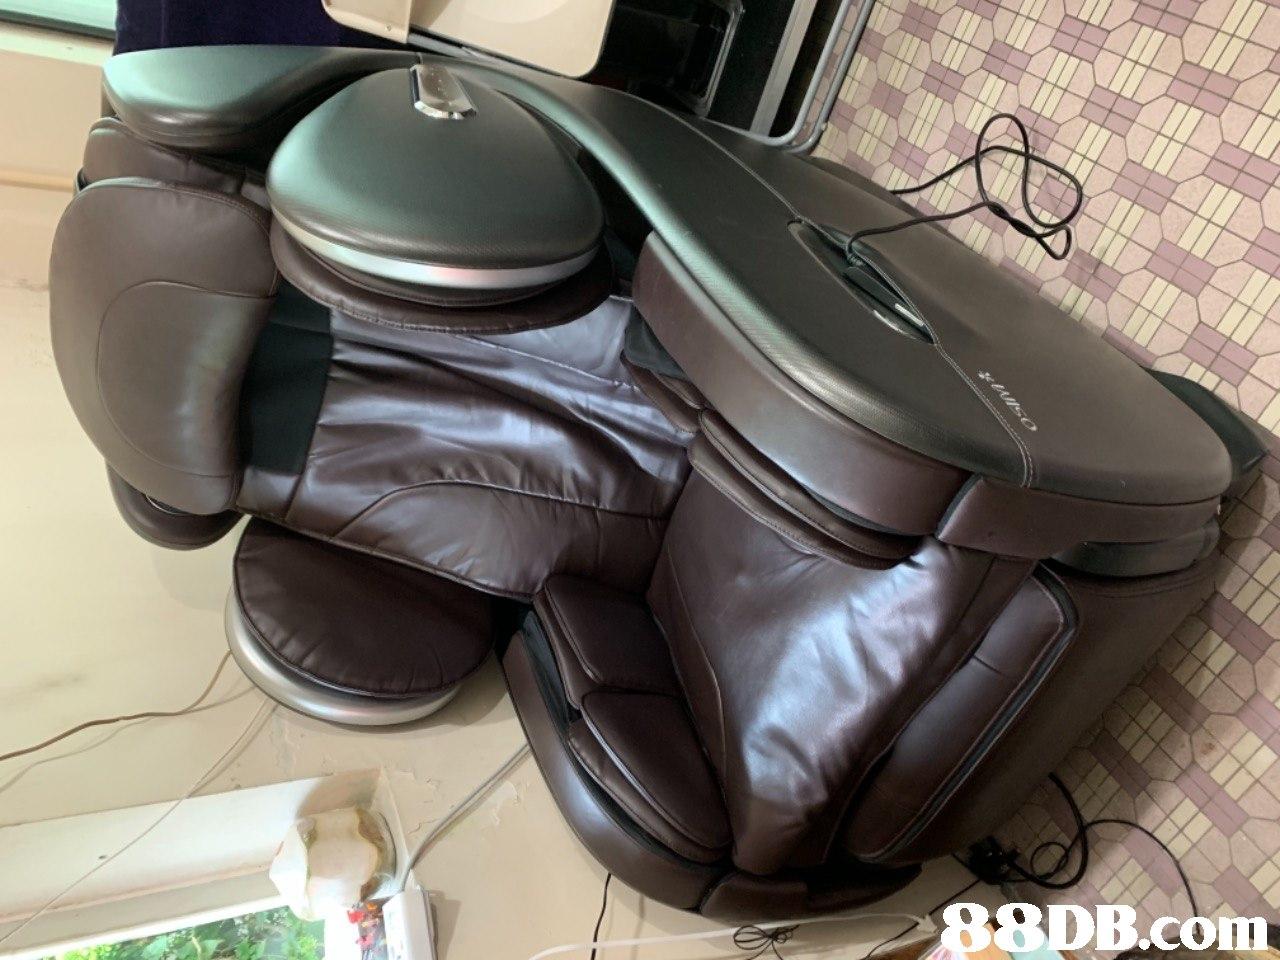 Massage chair,Footwear,Comfort,Bag,